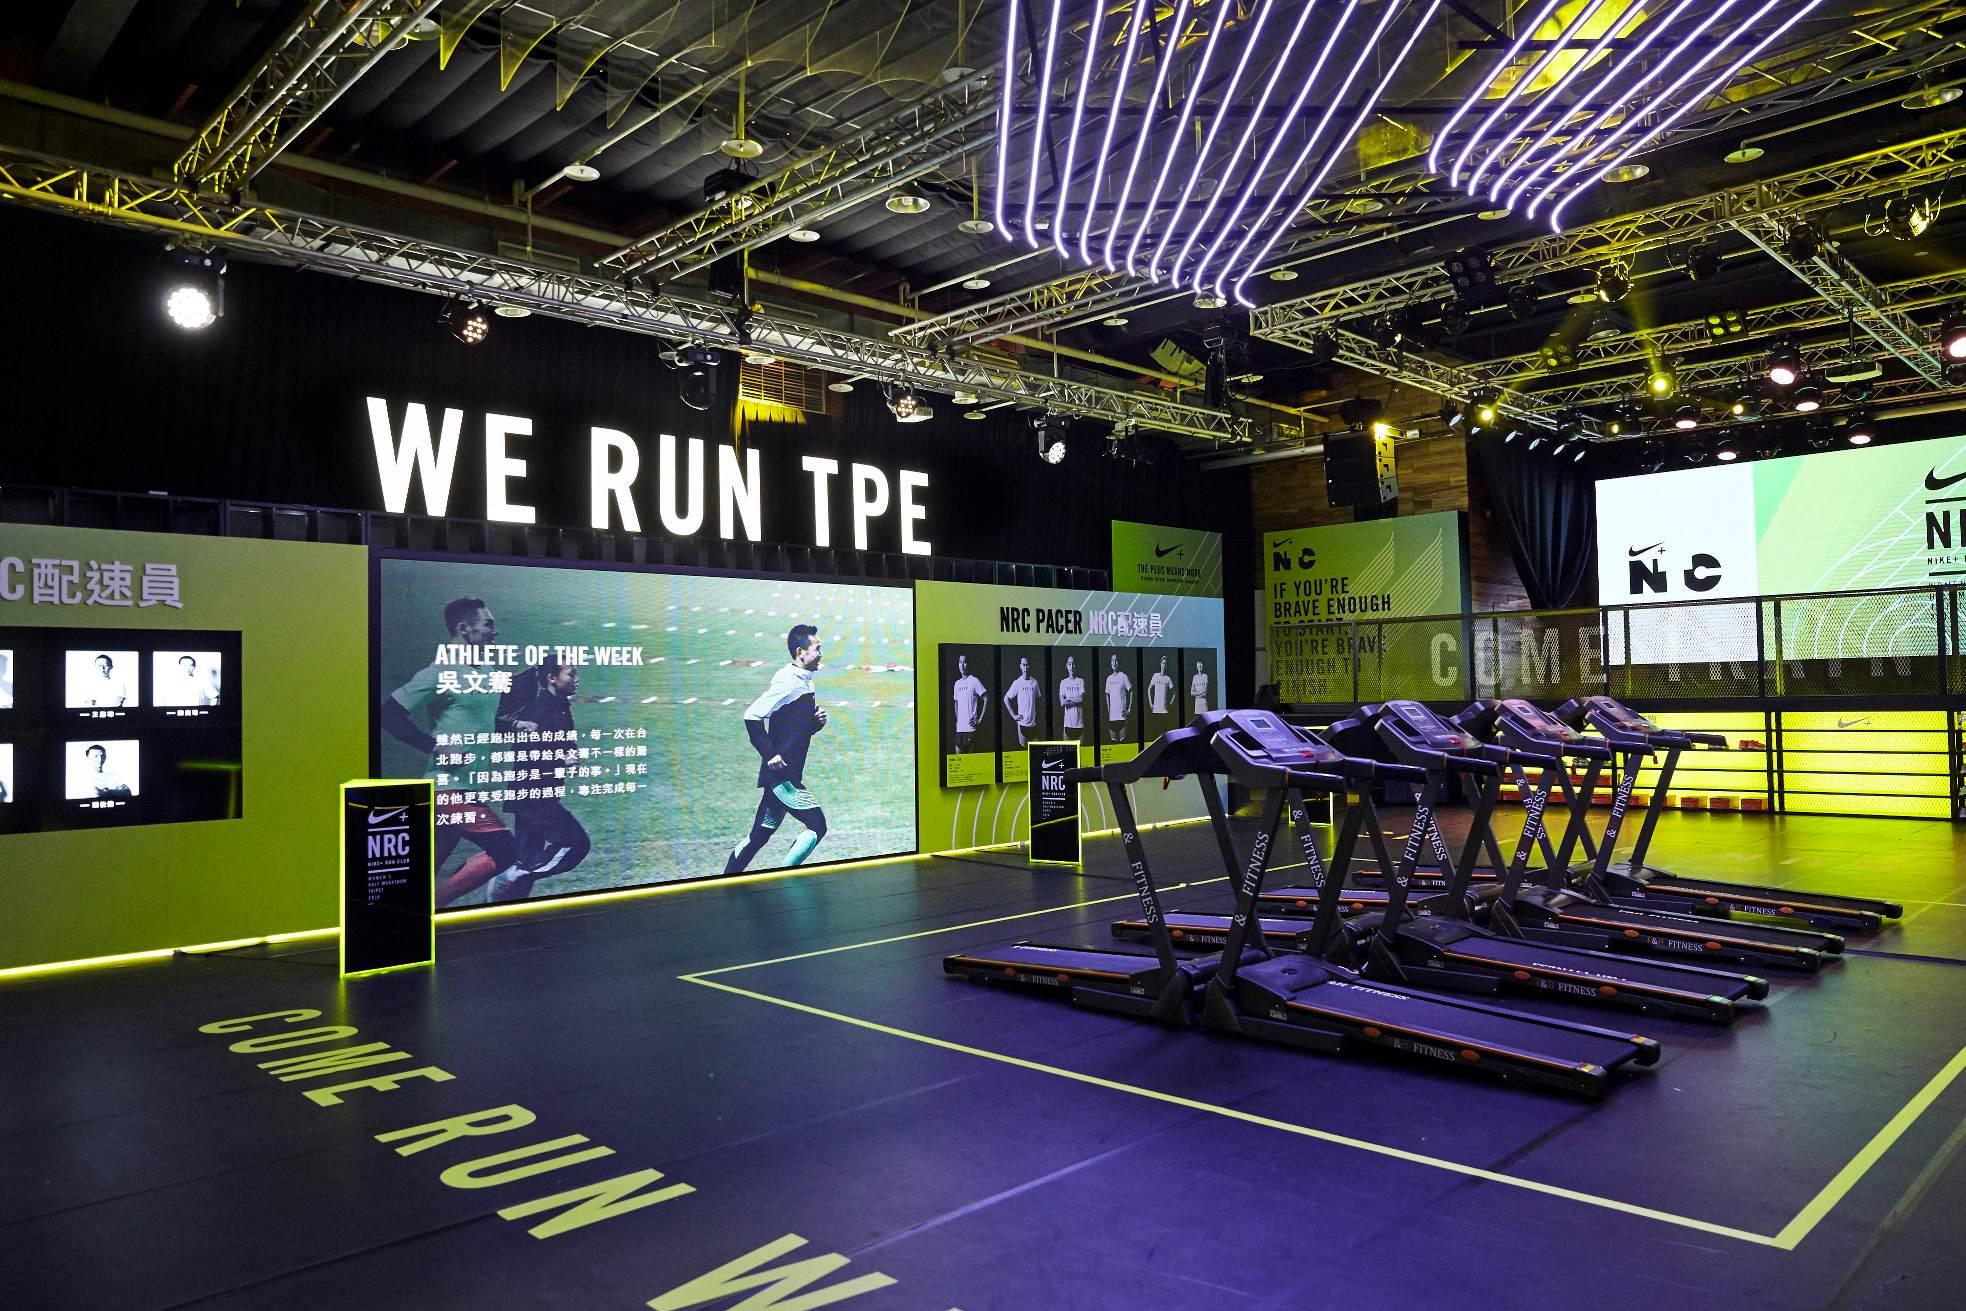 官方新聞 / Nike+ Run Club Women's Half Marathon Taipei 2016 EXPO 即日啟動